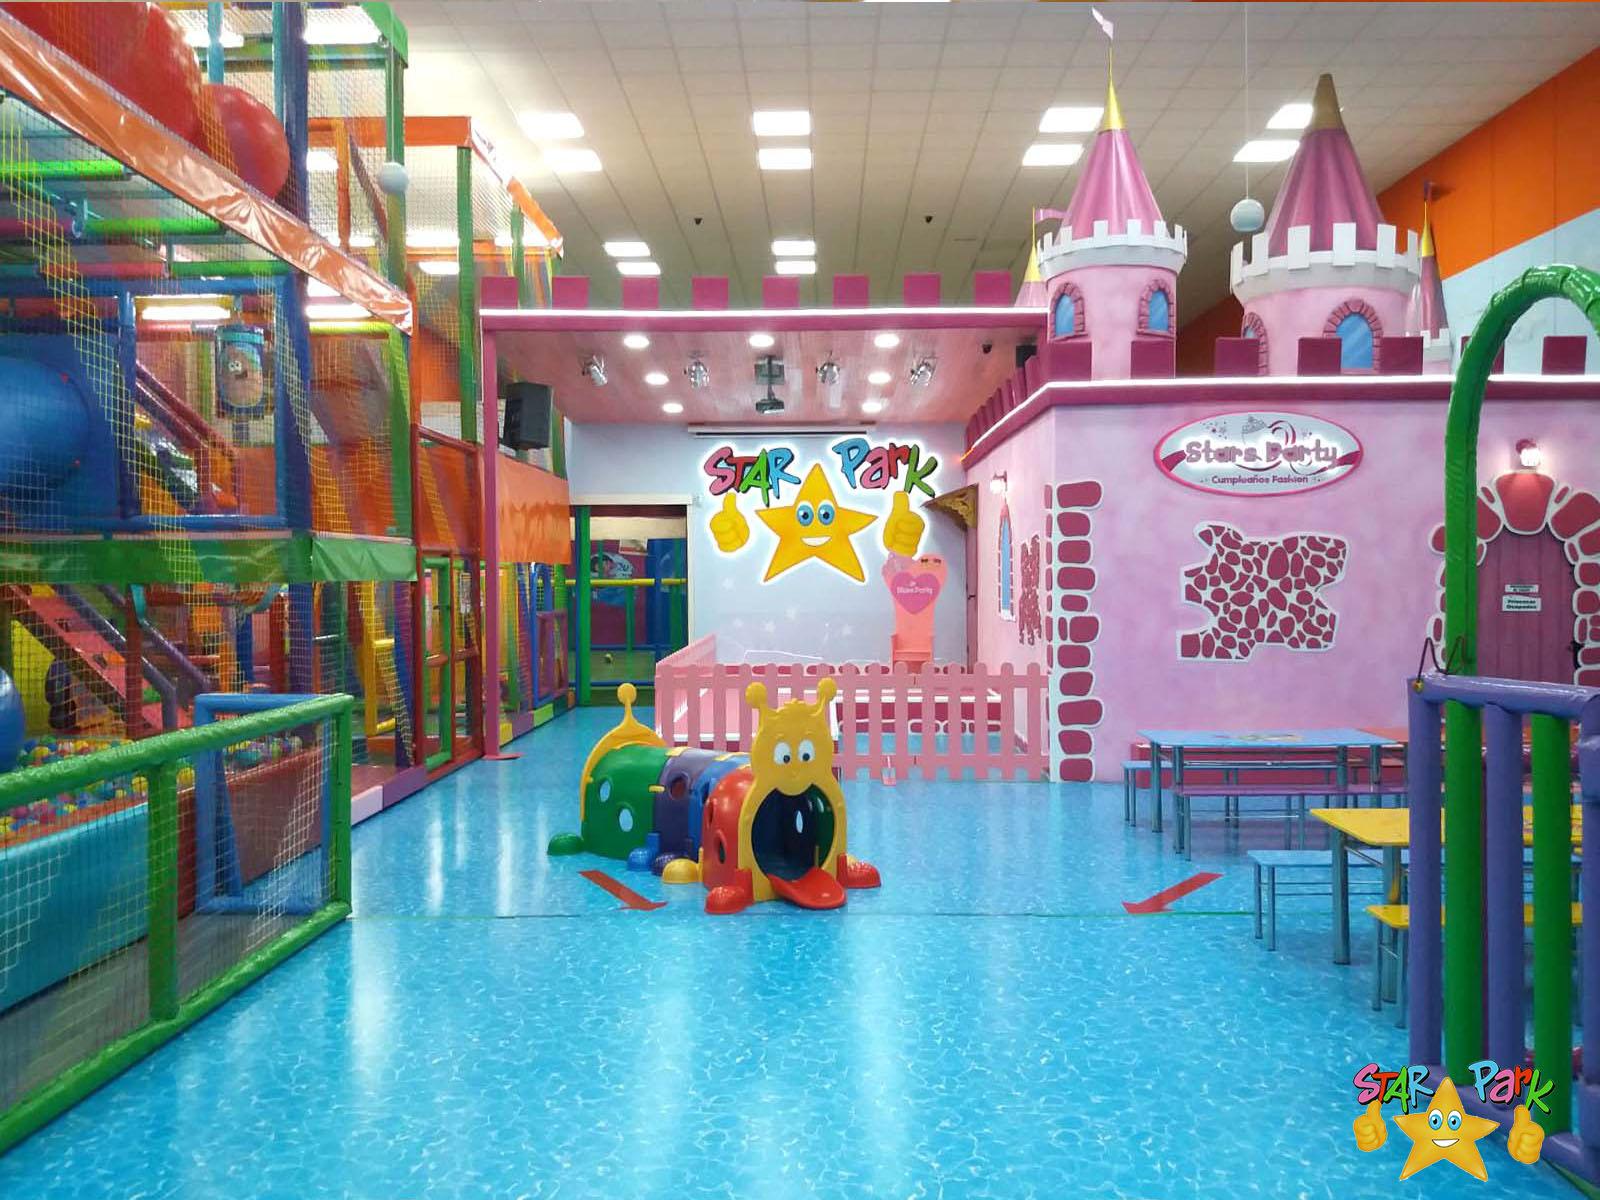 Star Party_Star Park